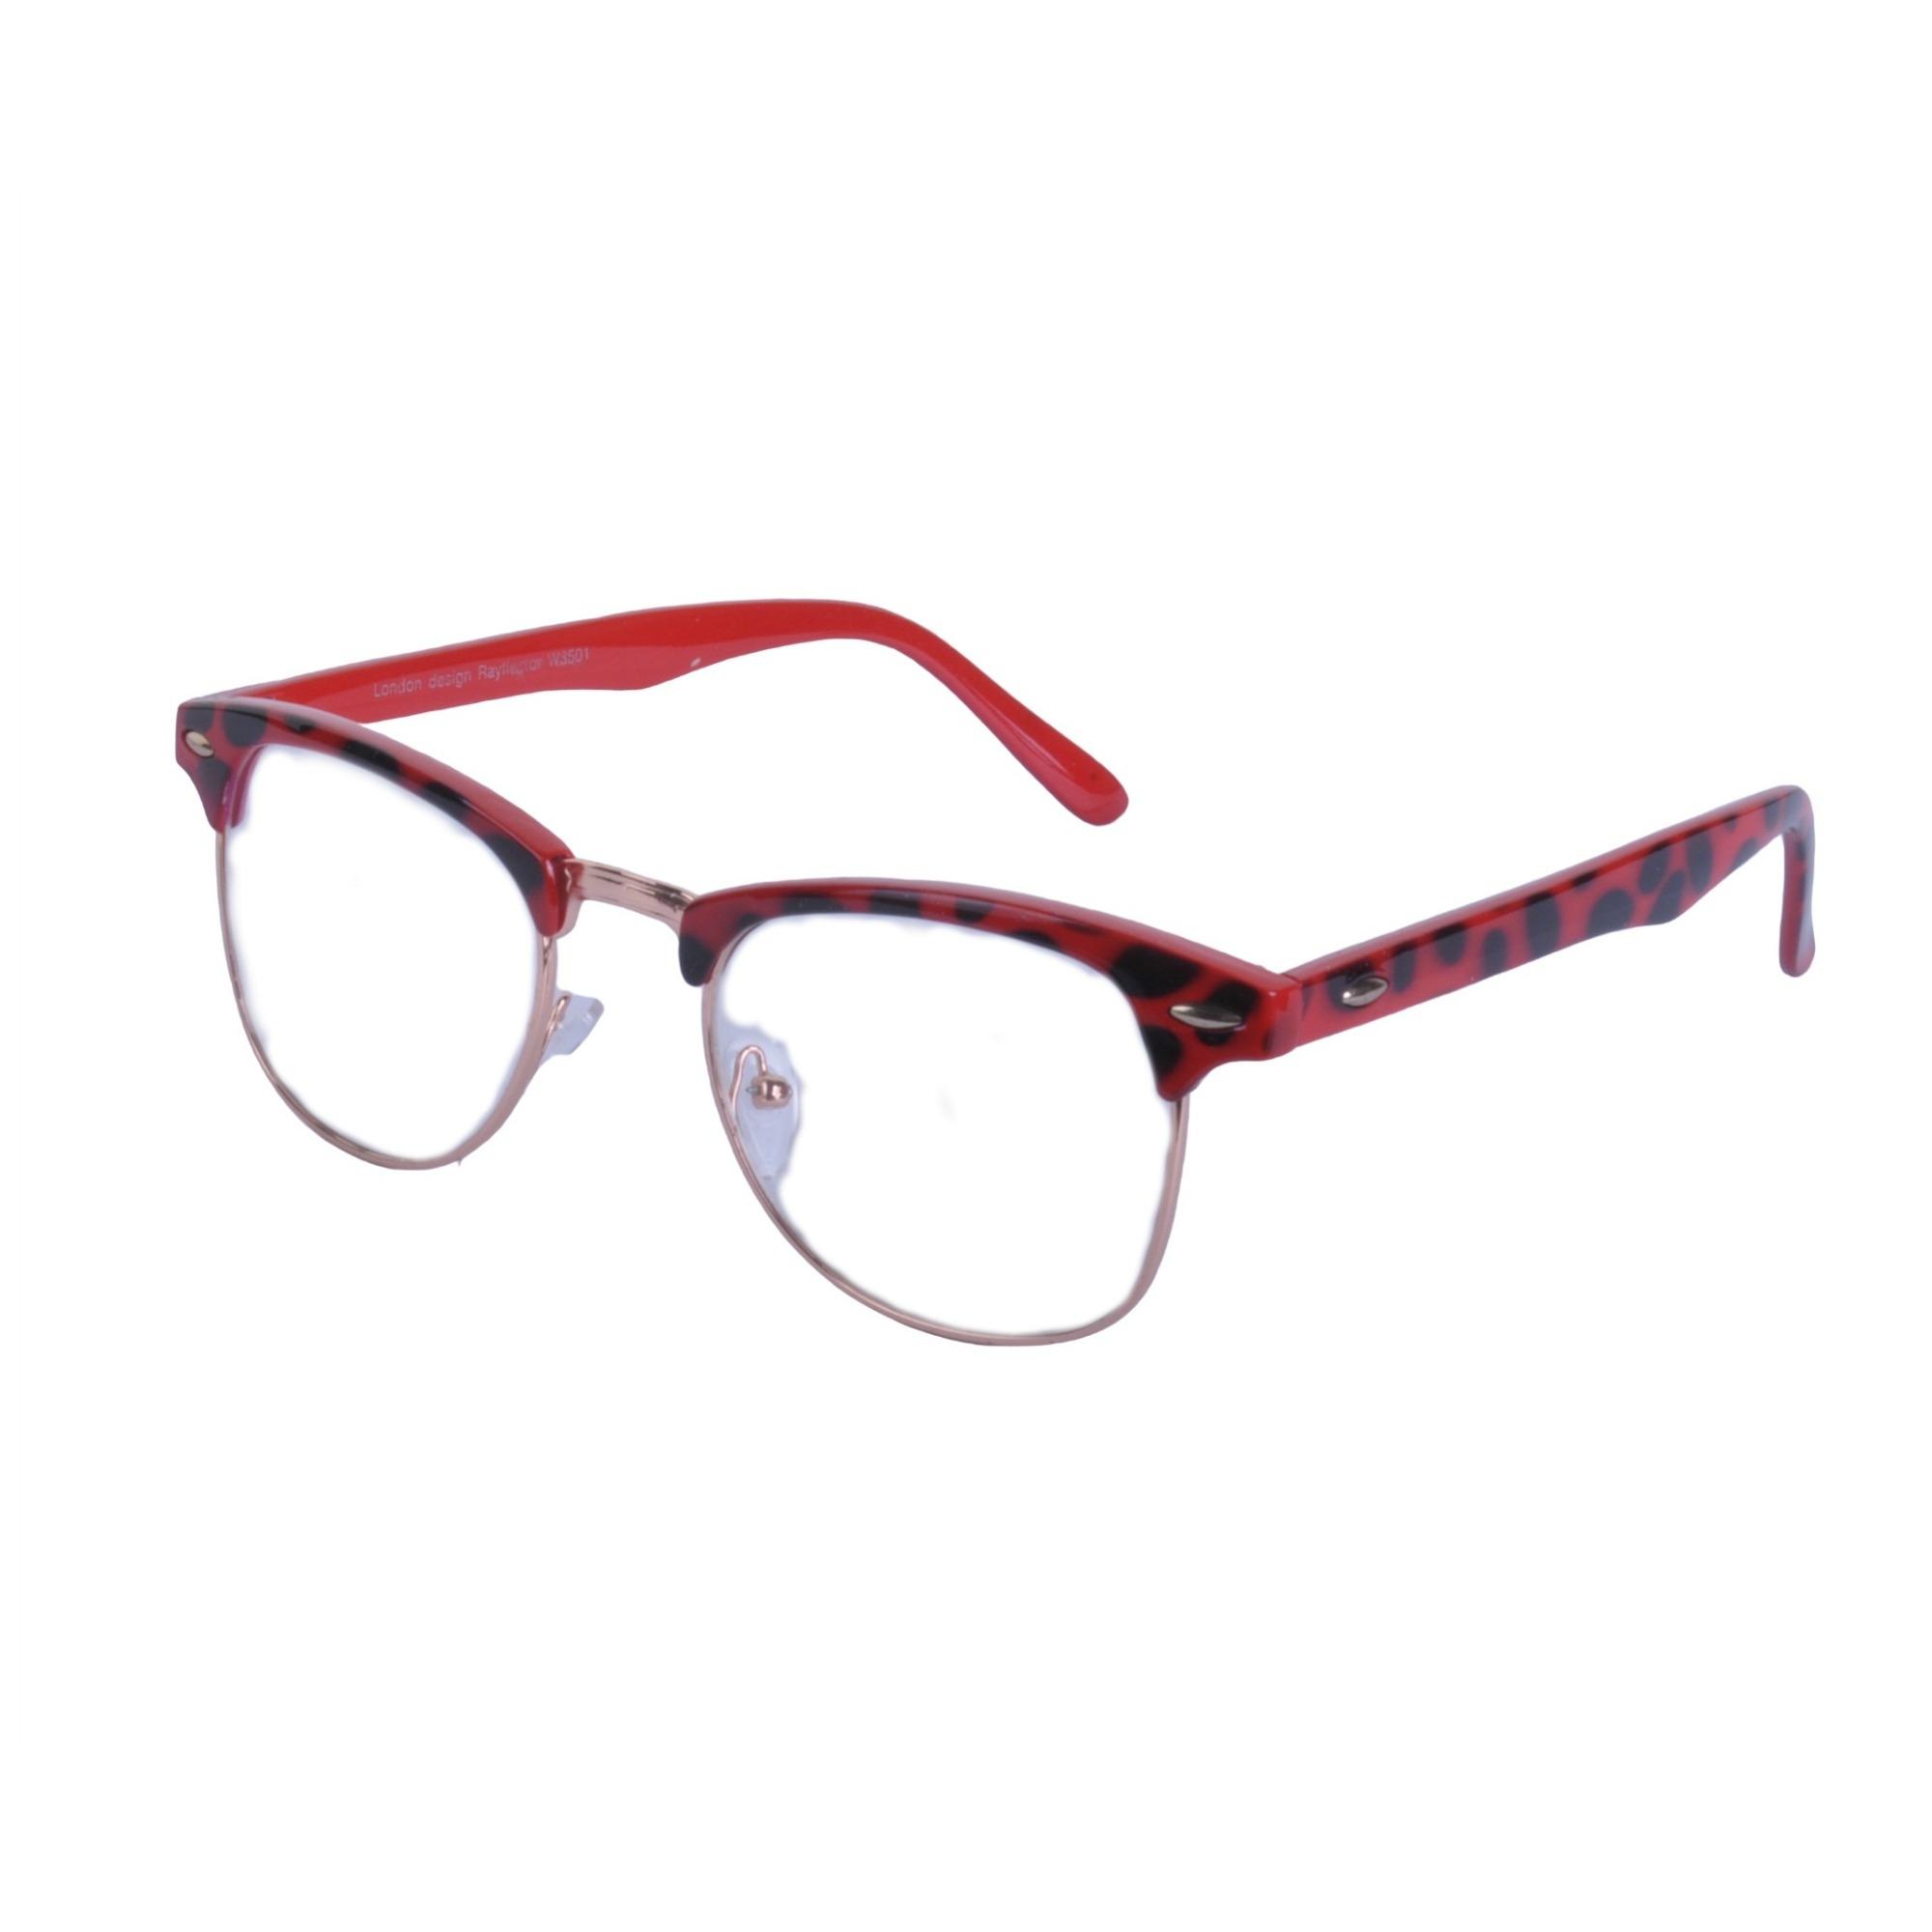 Vintage-Lente-Transparente-Cejas-Barra-Gafas-Gafas-de-Sol-Hron-Borde-Negro miniatura 12